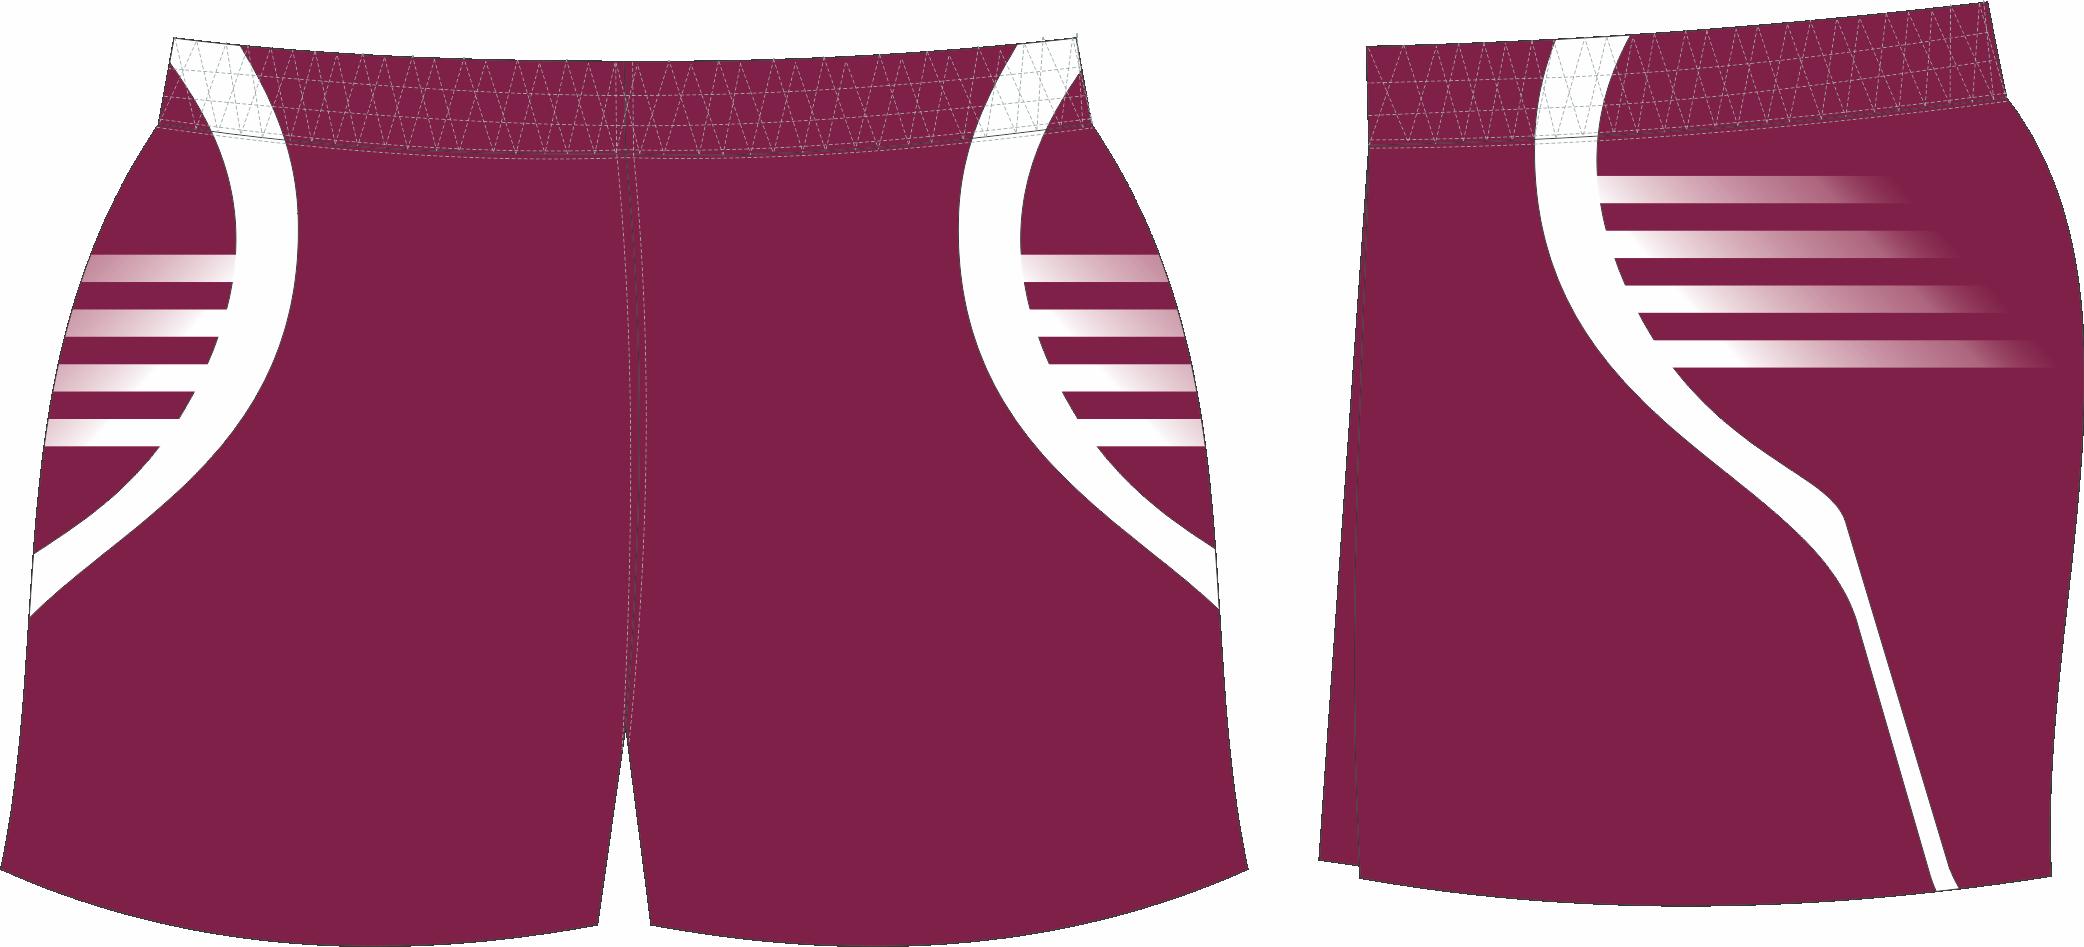 S201XSHT Maroon White club Shorts.png